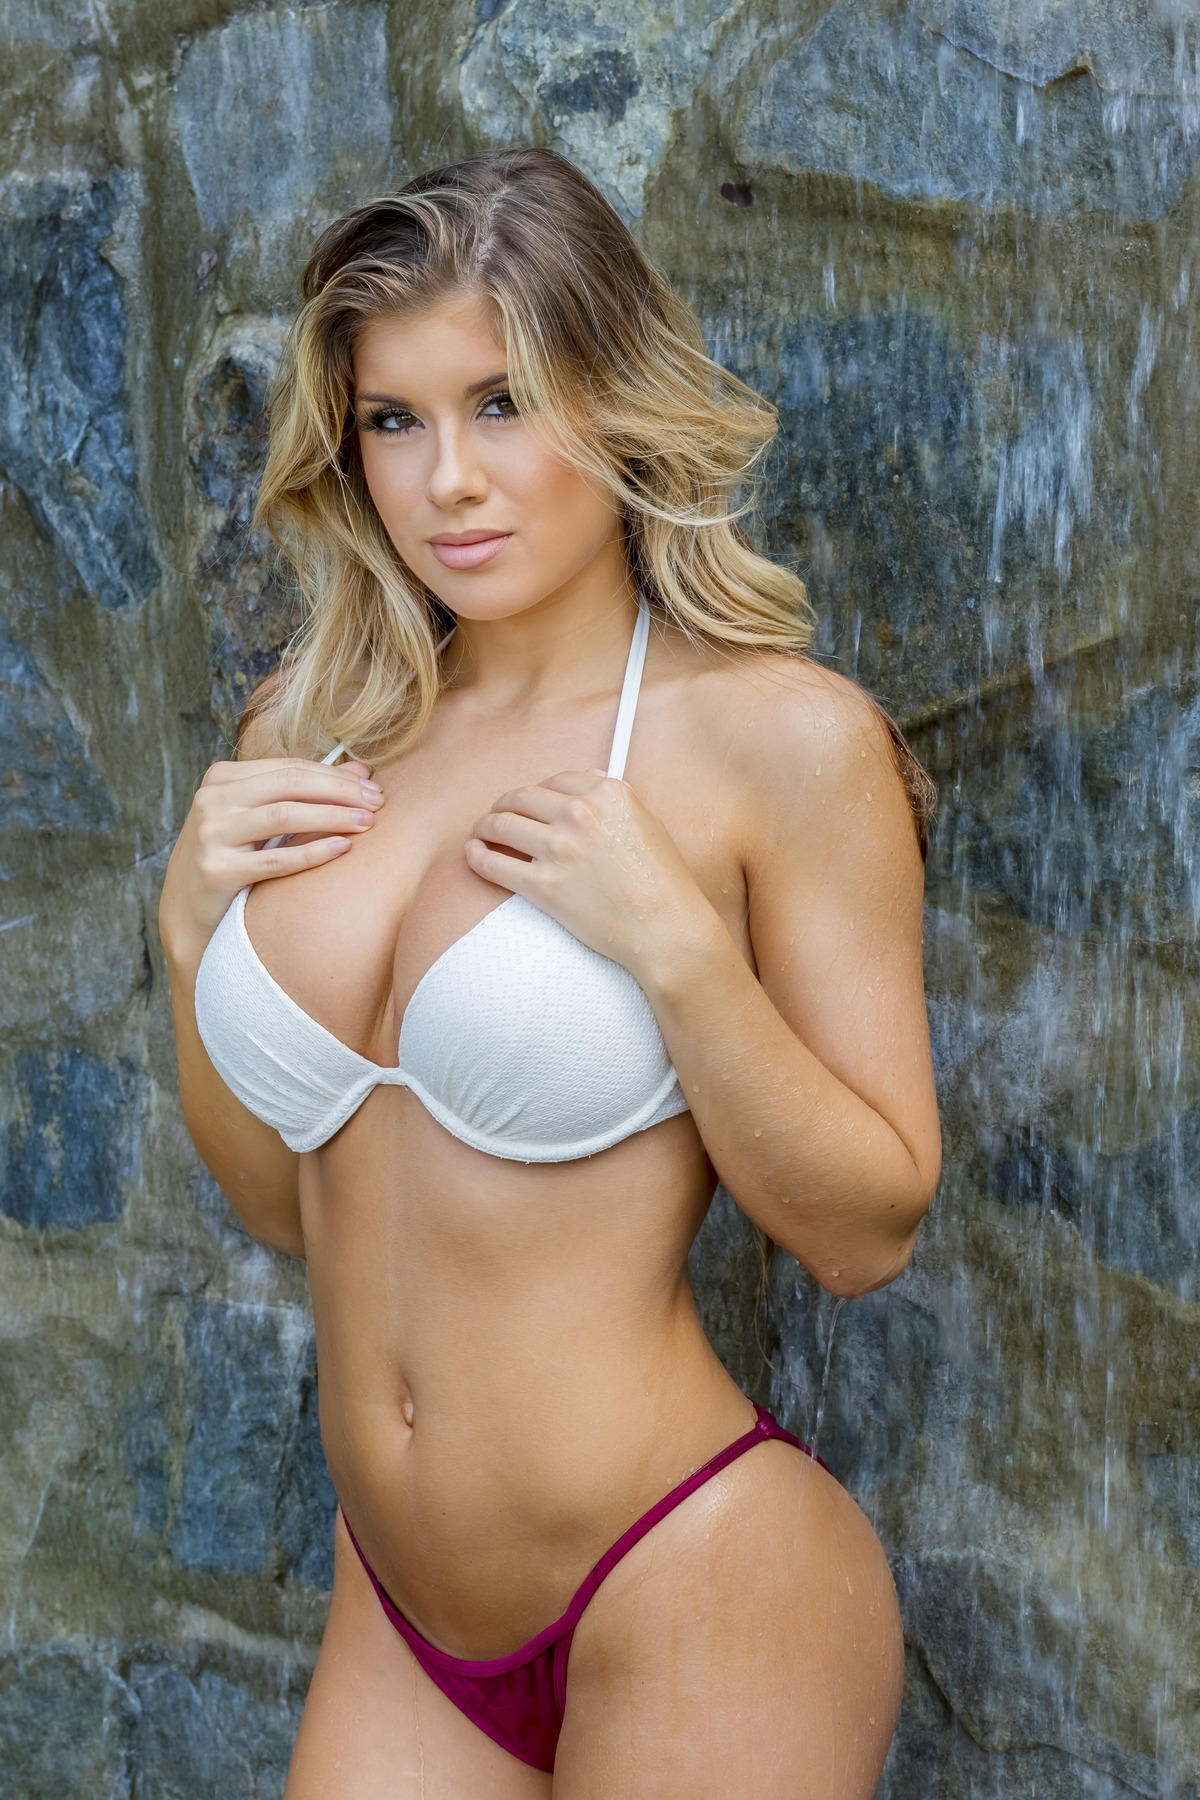 Sexy Girl am Wasserfall